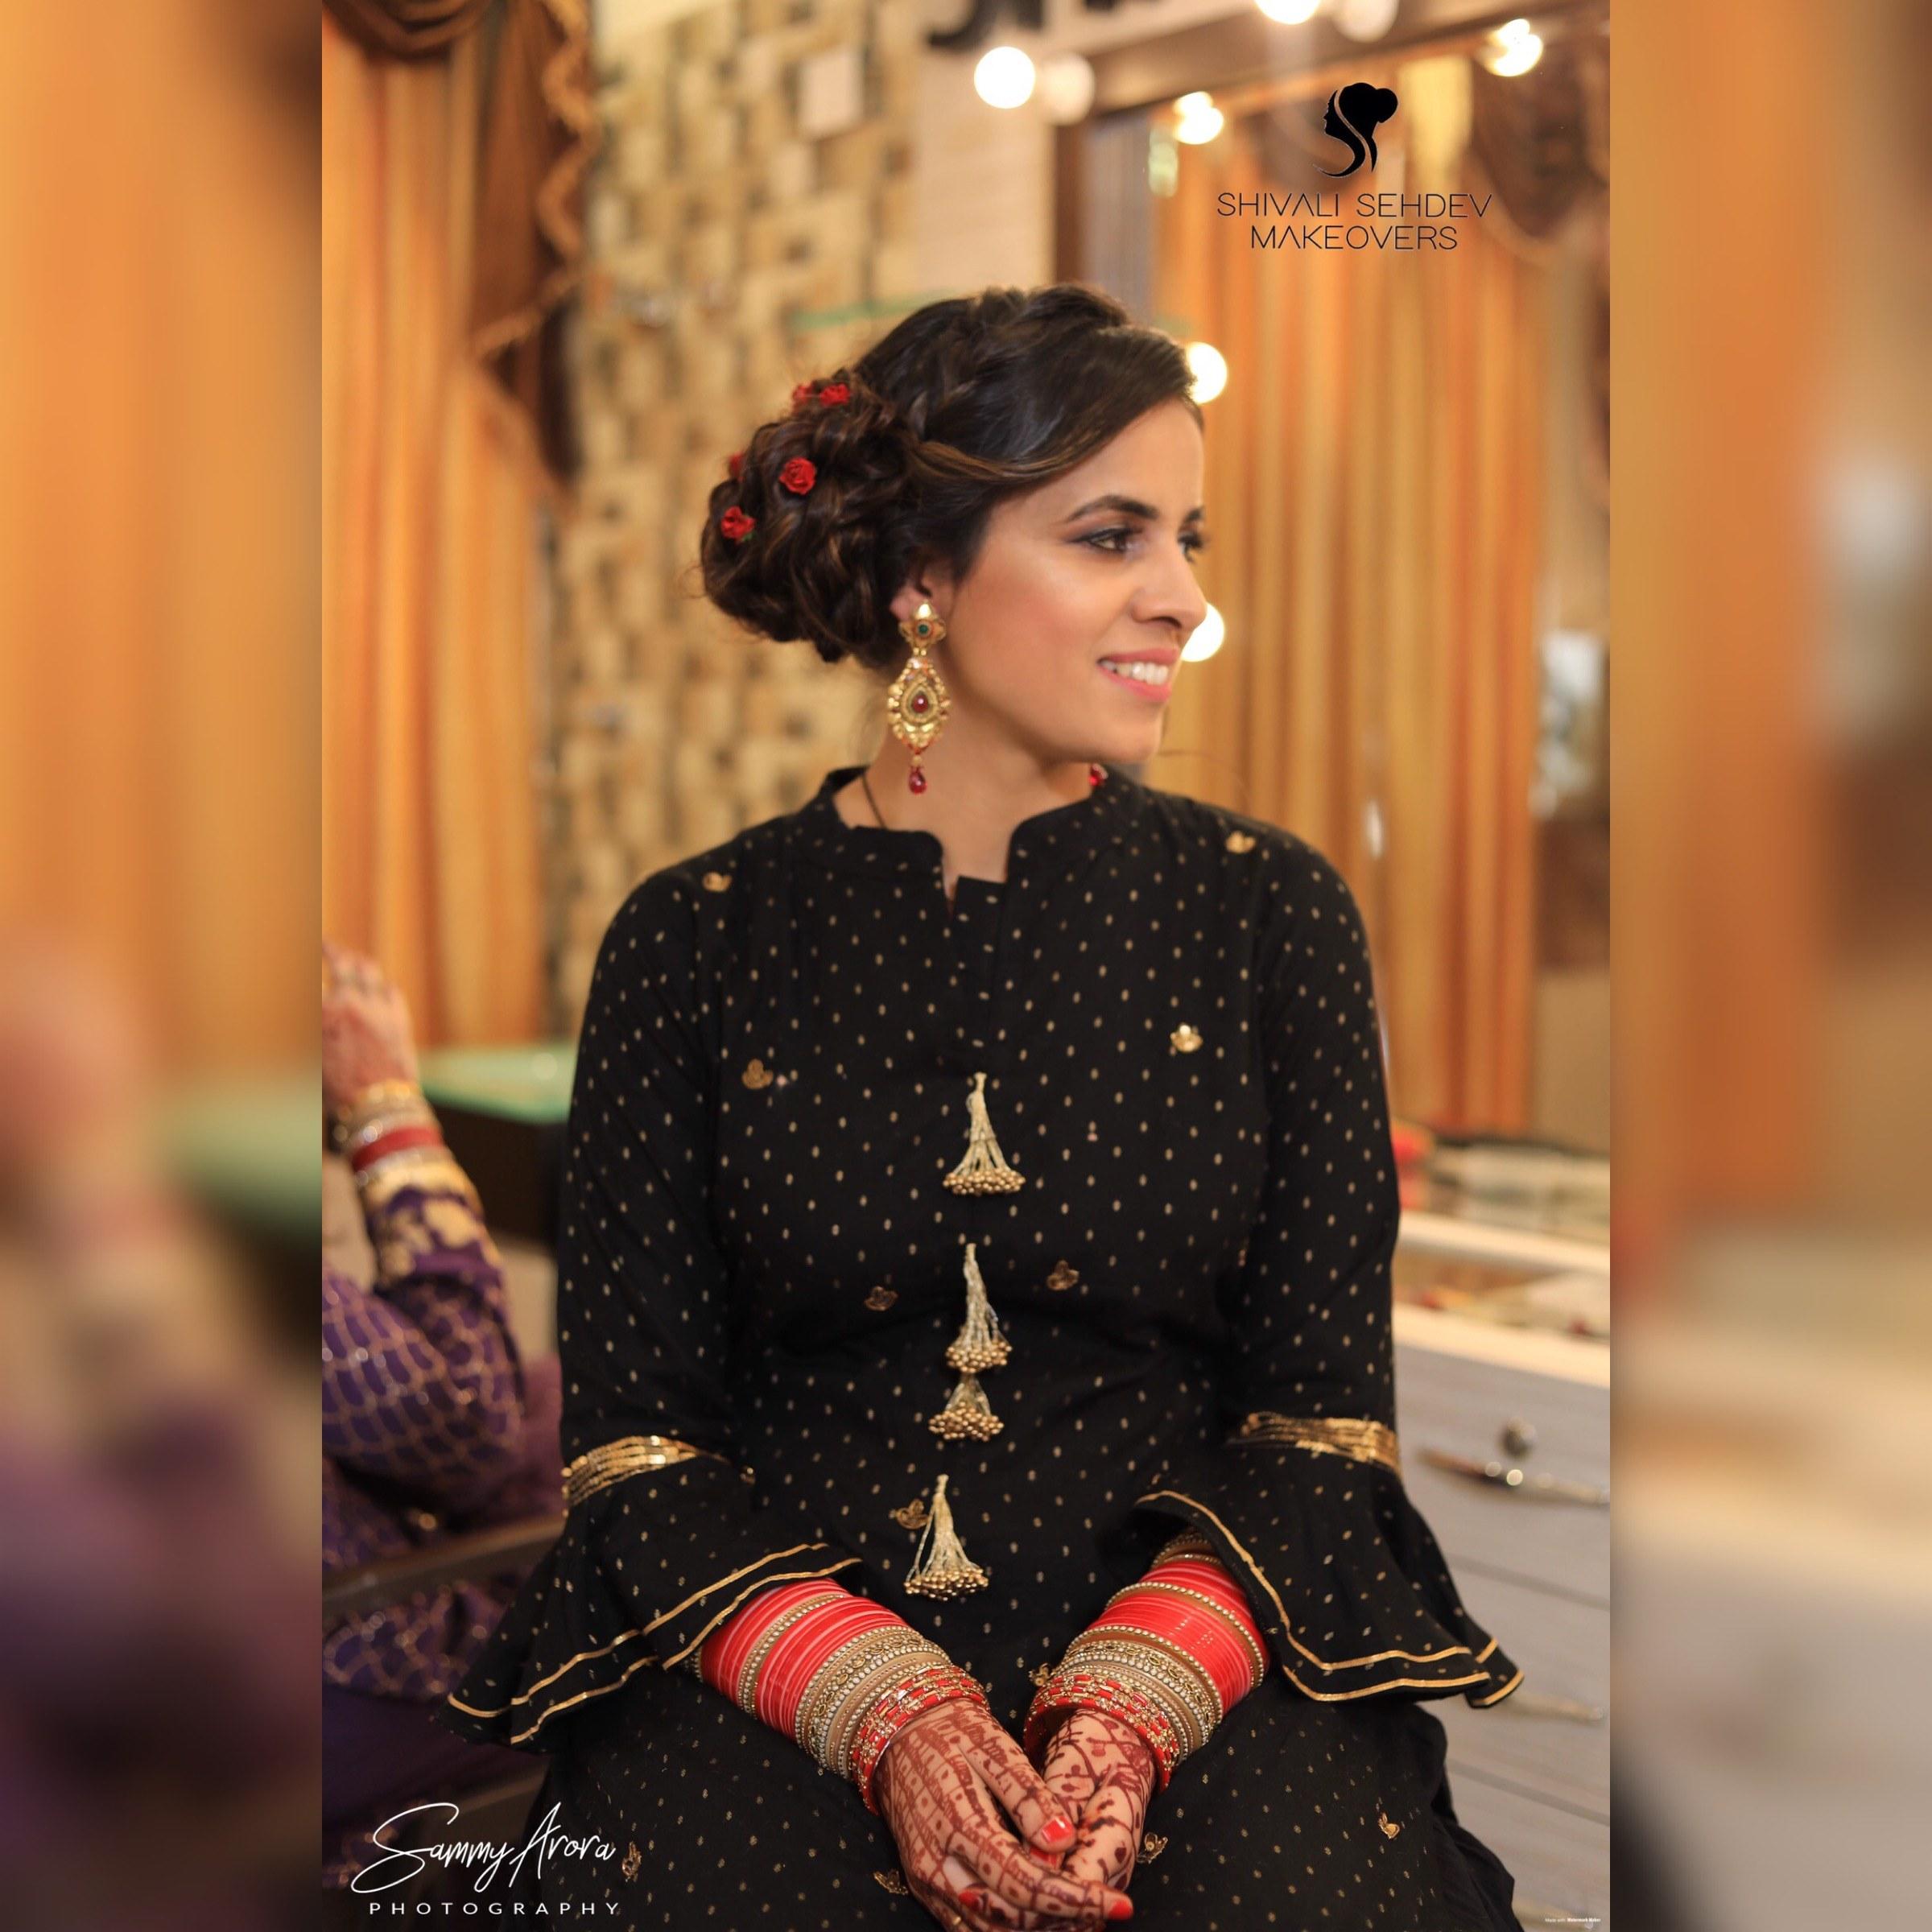 Portfolio - Shivali Sehdev Makeovers